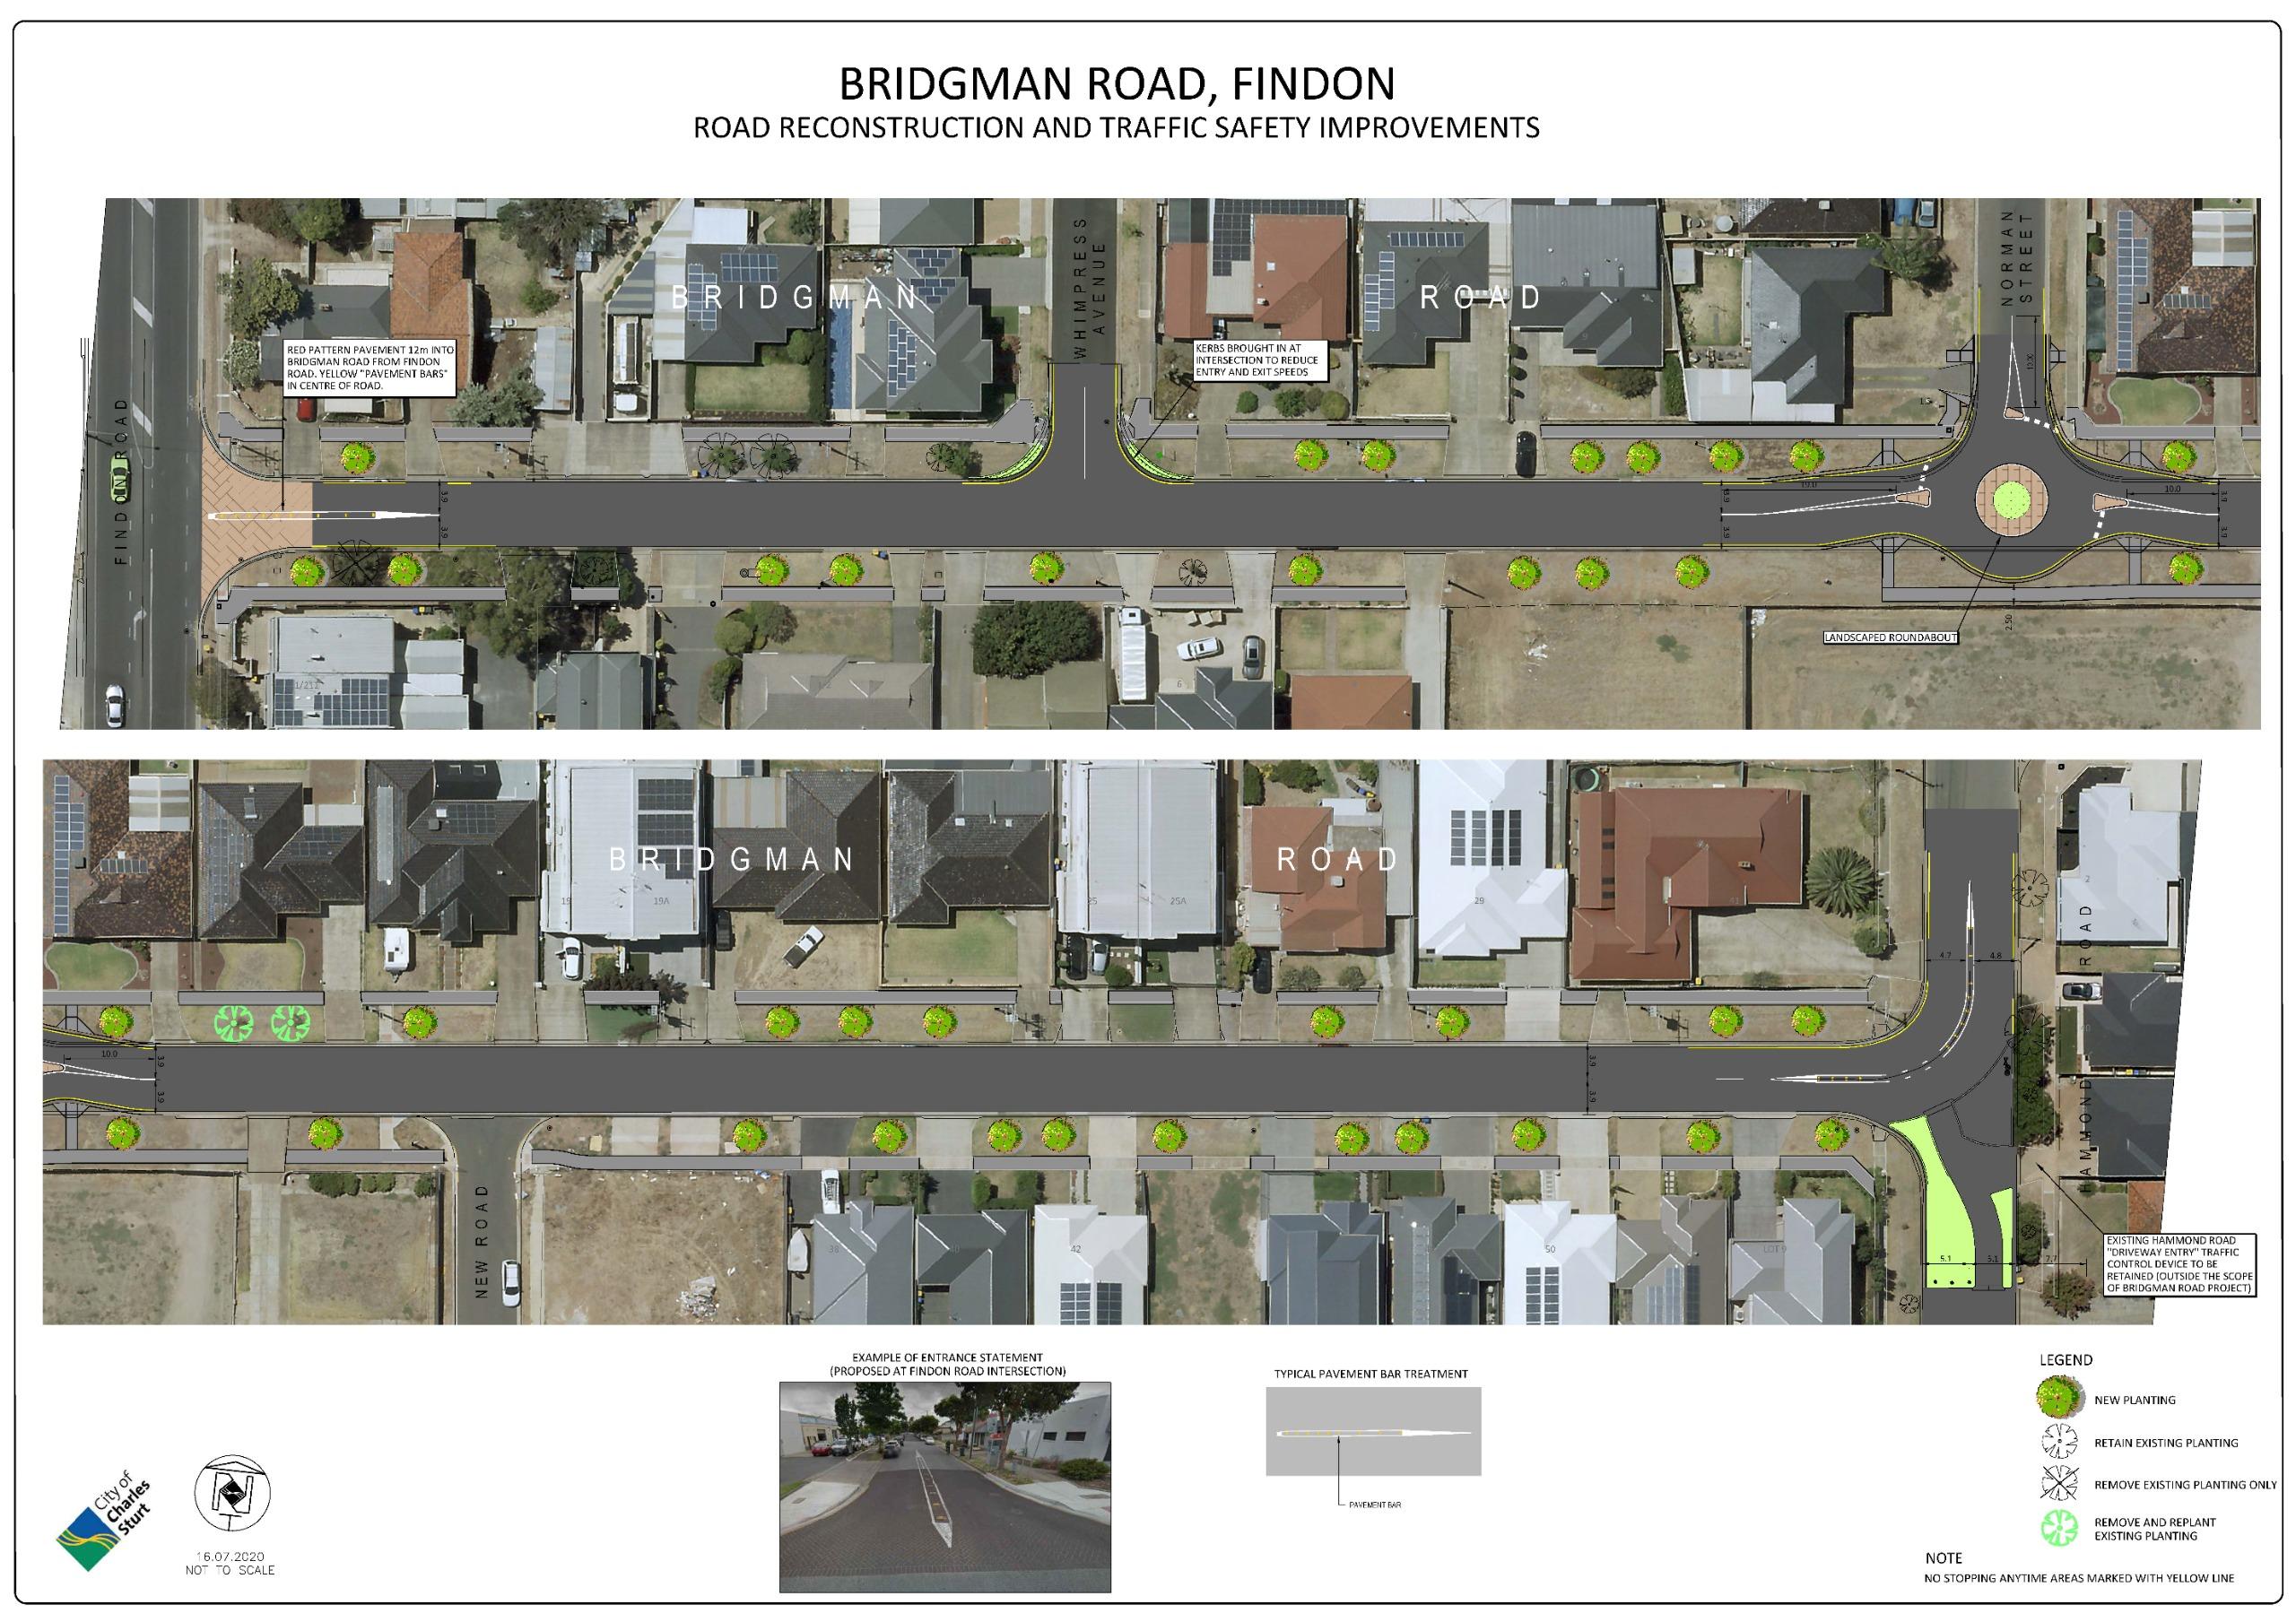 Bridgman Road concept plan